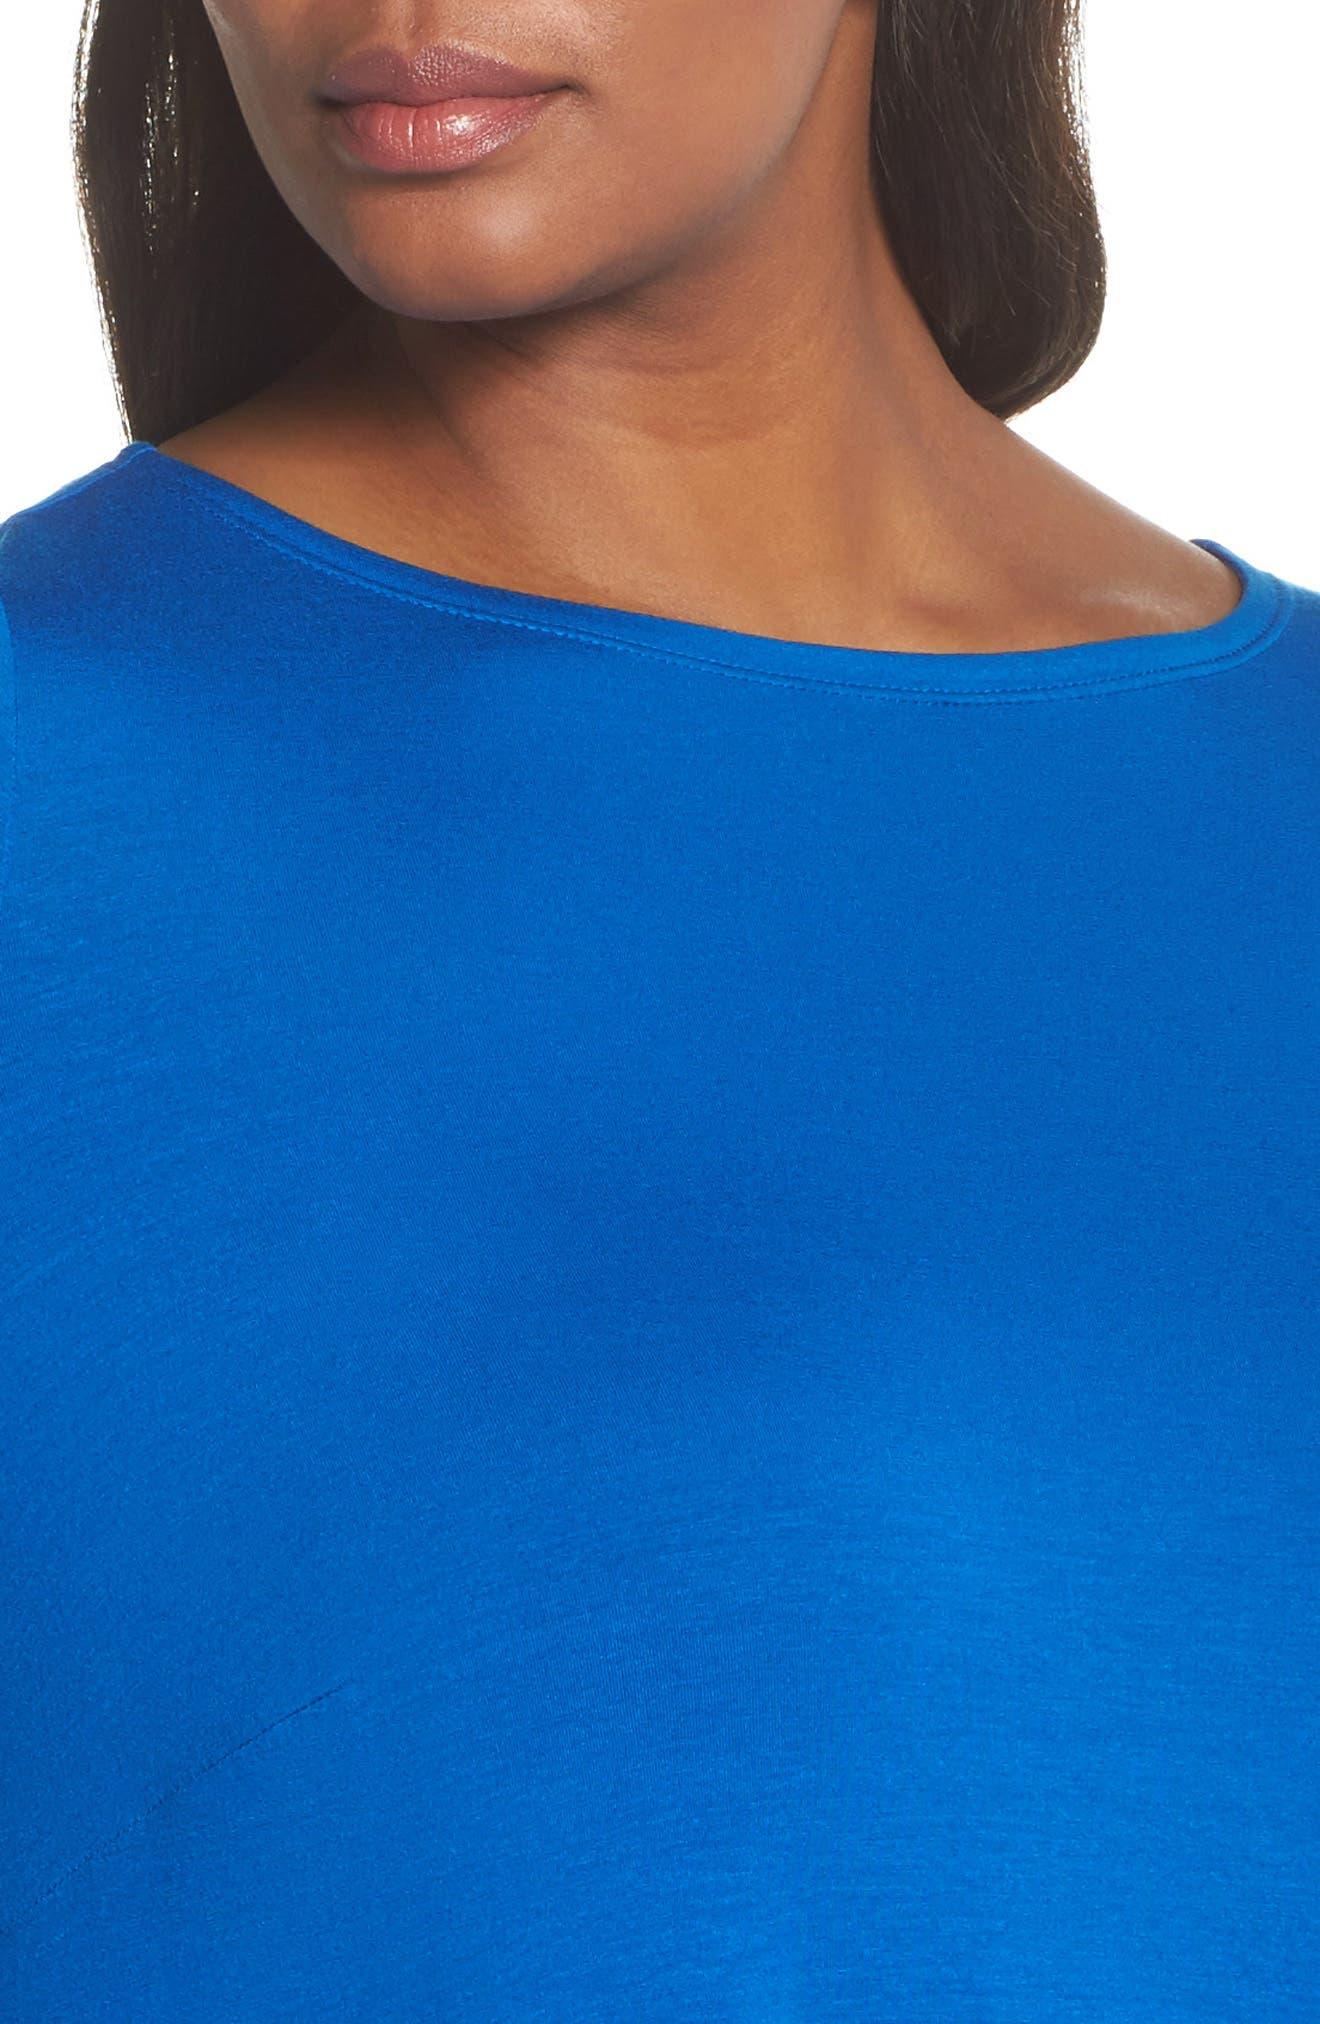 Jersey Tunic Dress,                             Alternate thumbnail 15, color,